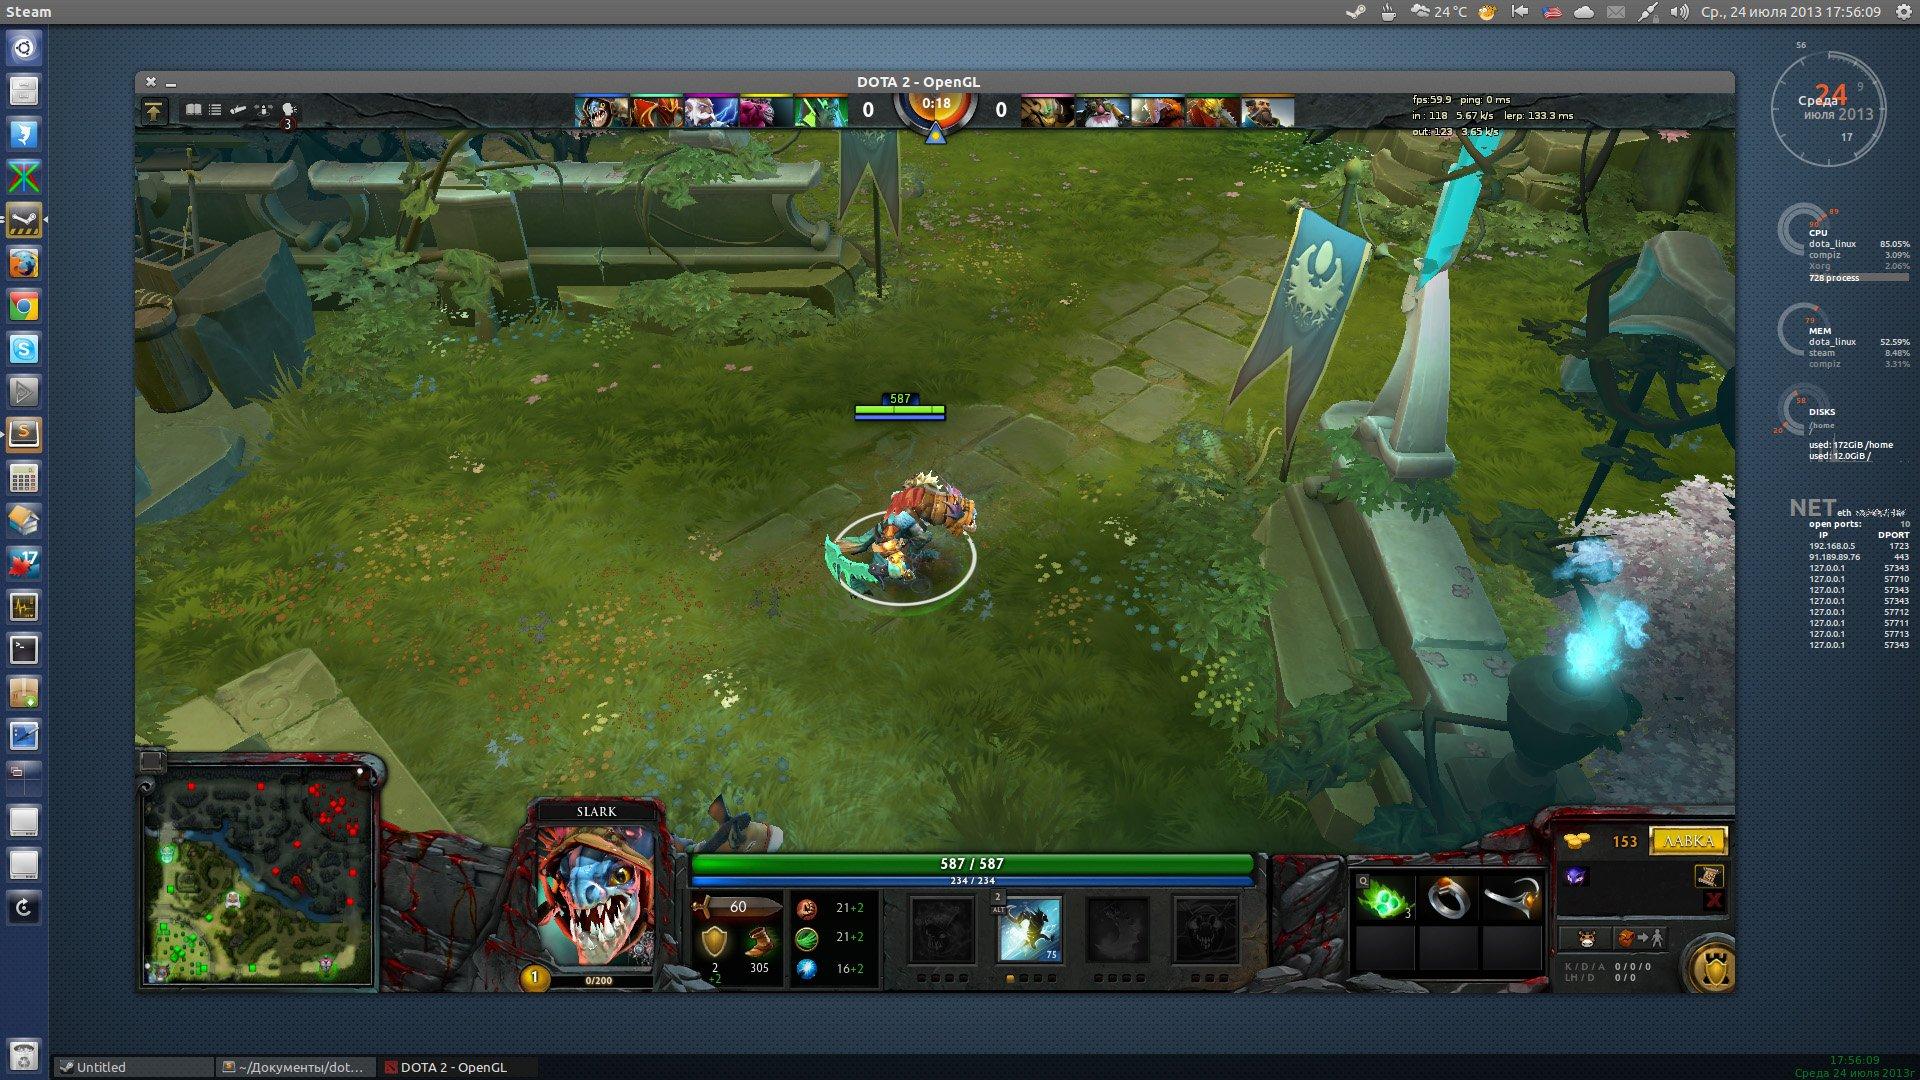 Dota 2, Linux, Ubuntu 13.04 x86_64, Nvidia GTX 550 Ti, driver Nvidia 325.08 beta - Изображение 1